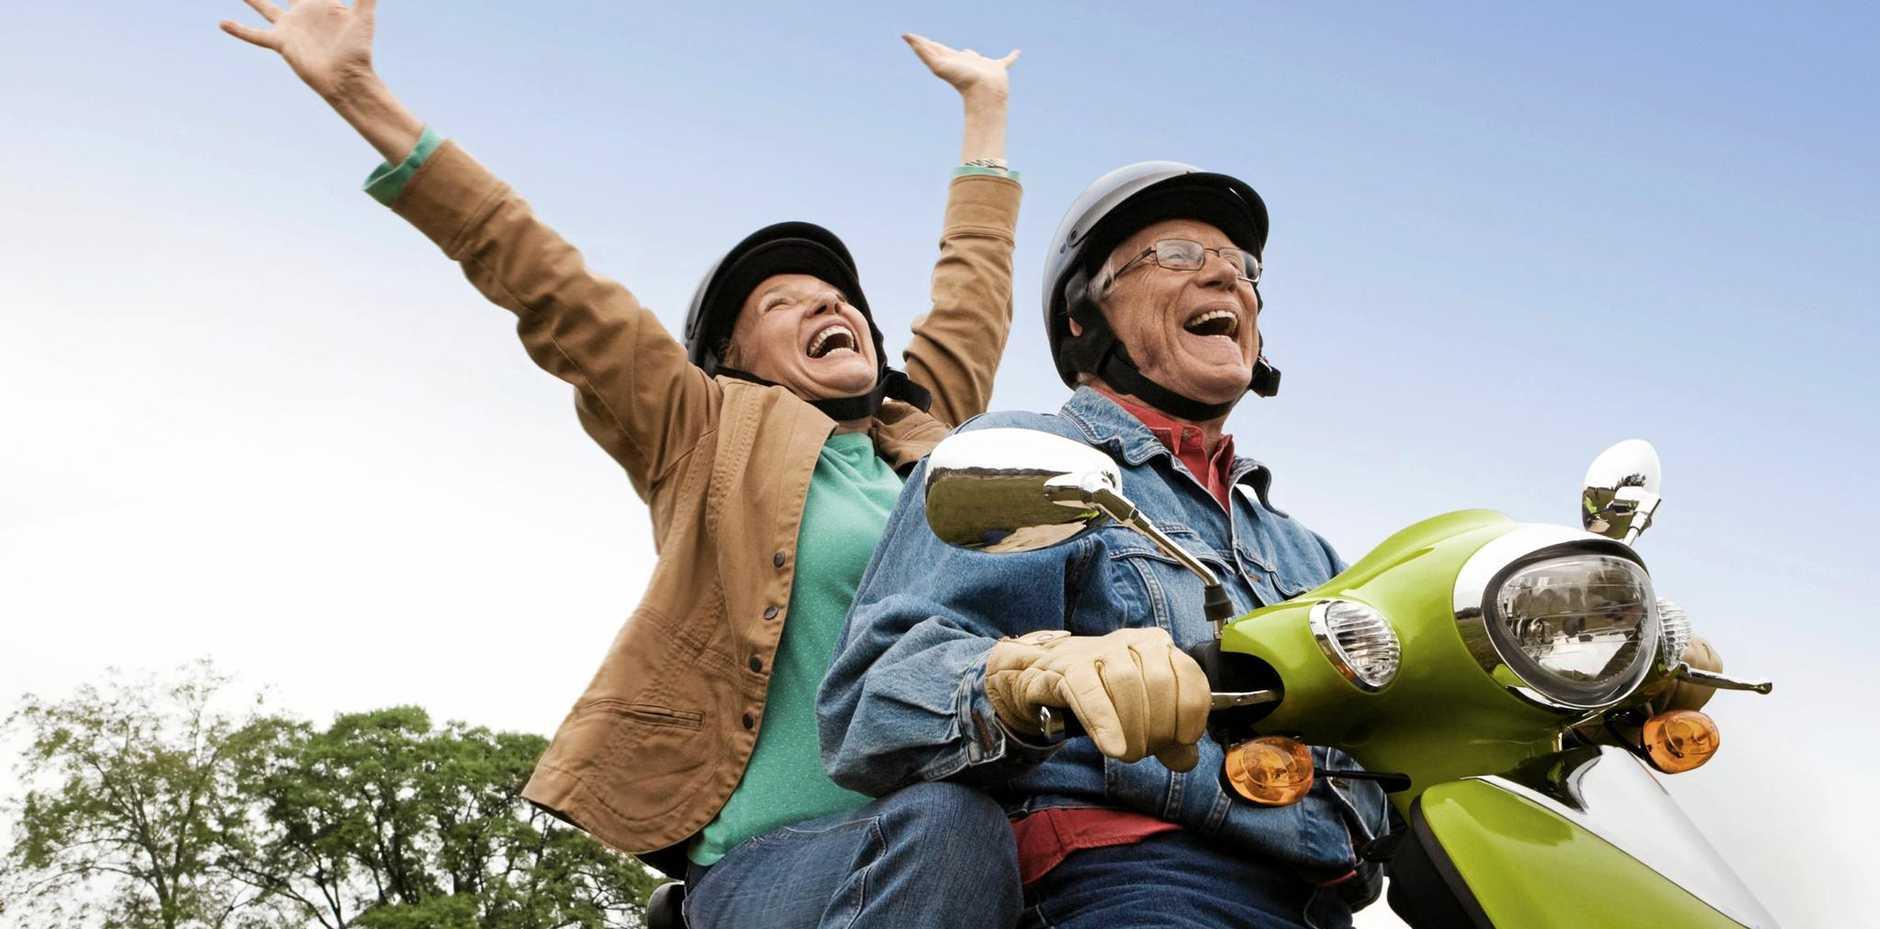 Senior couple riding motor scooter having fun.